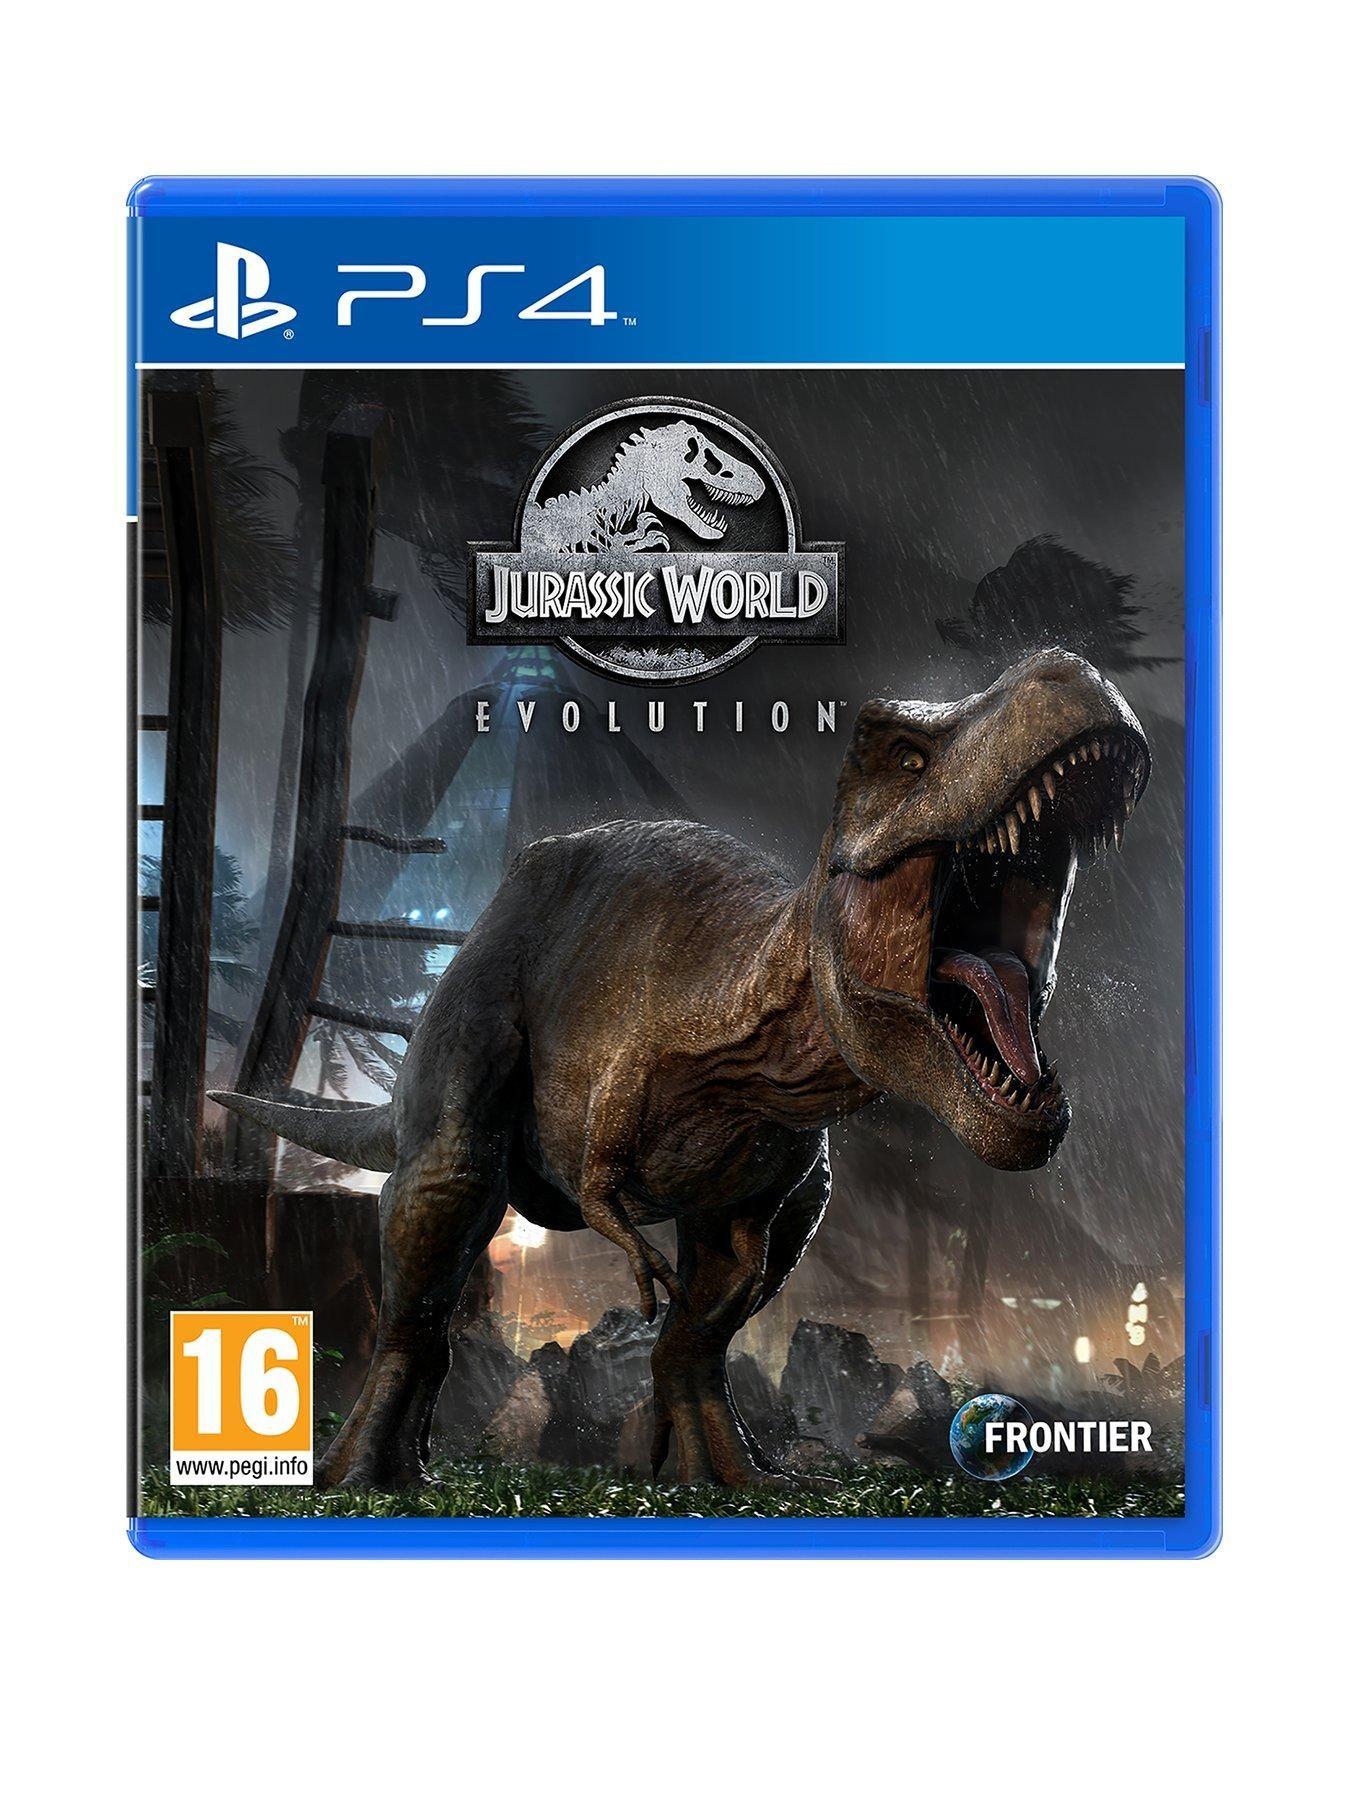 Jurassic World Evolution PS4 Jurassic world